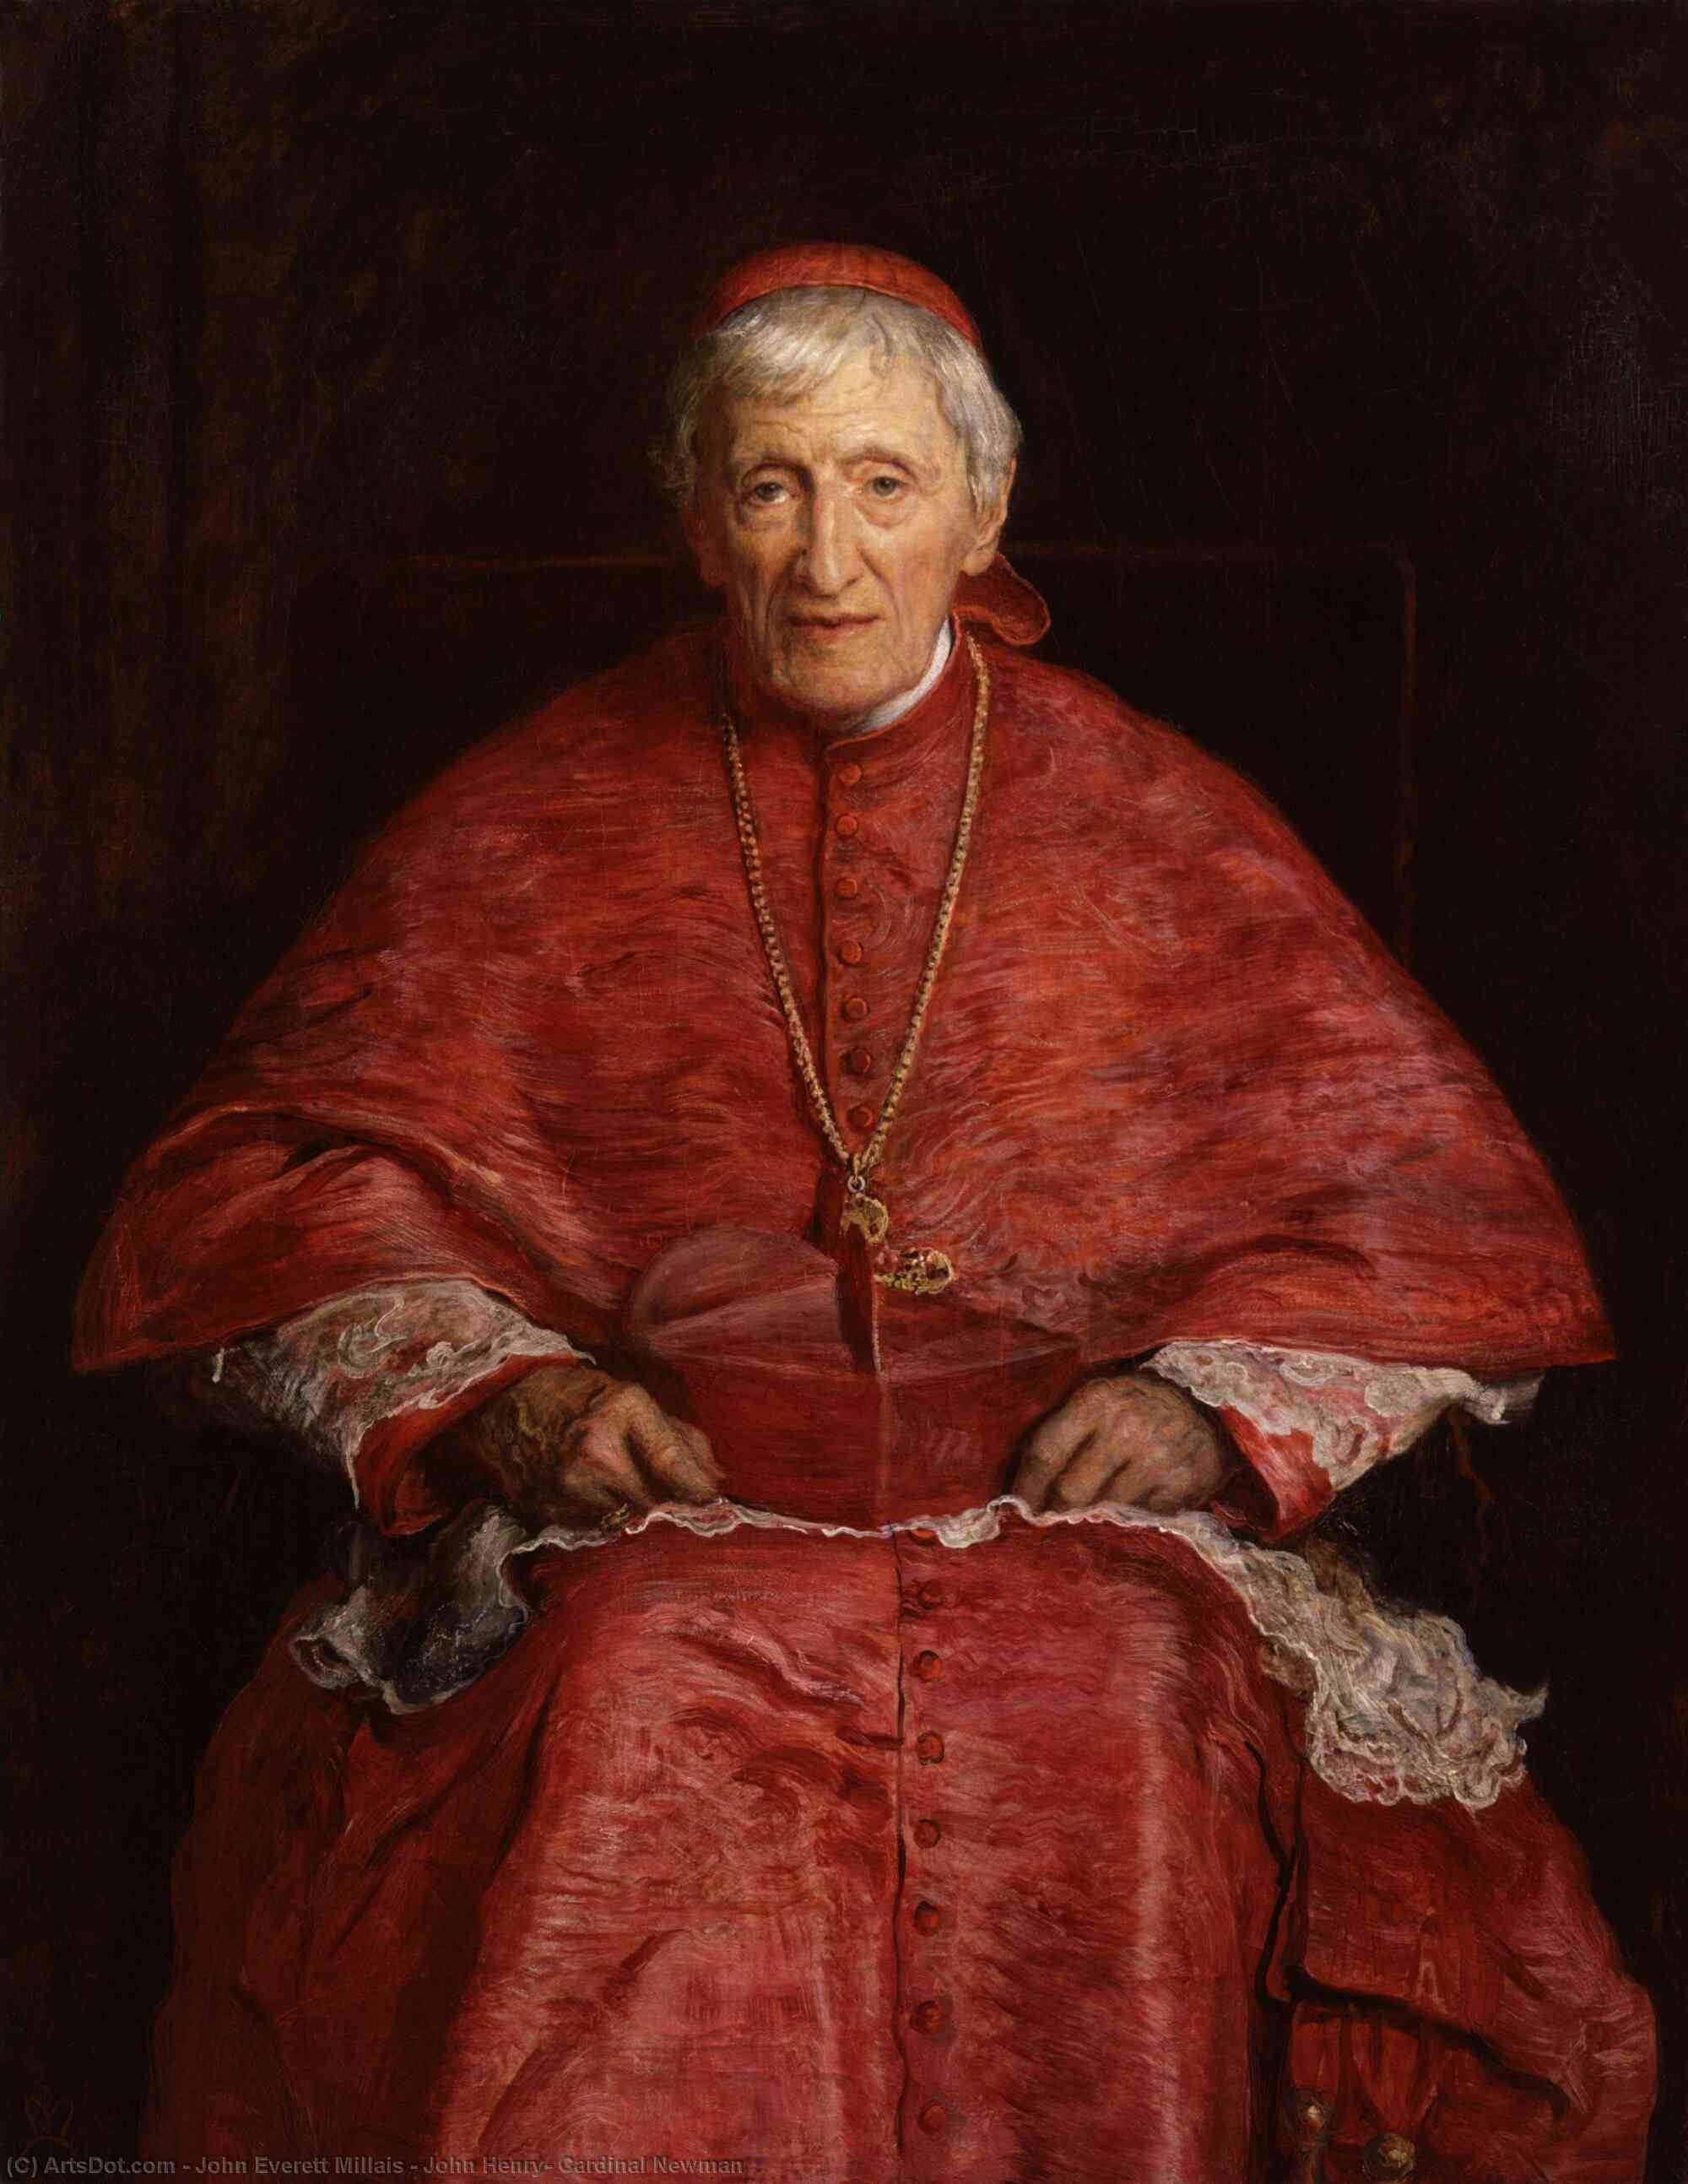 Wikioo.org - The Encyclopedia of Fine Arts - Painting, Artwork by John Everett Millais - John Henry, Cardinal Newman